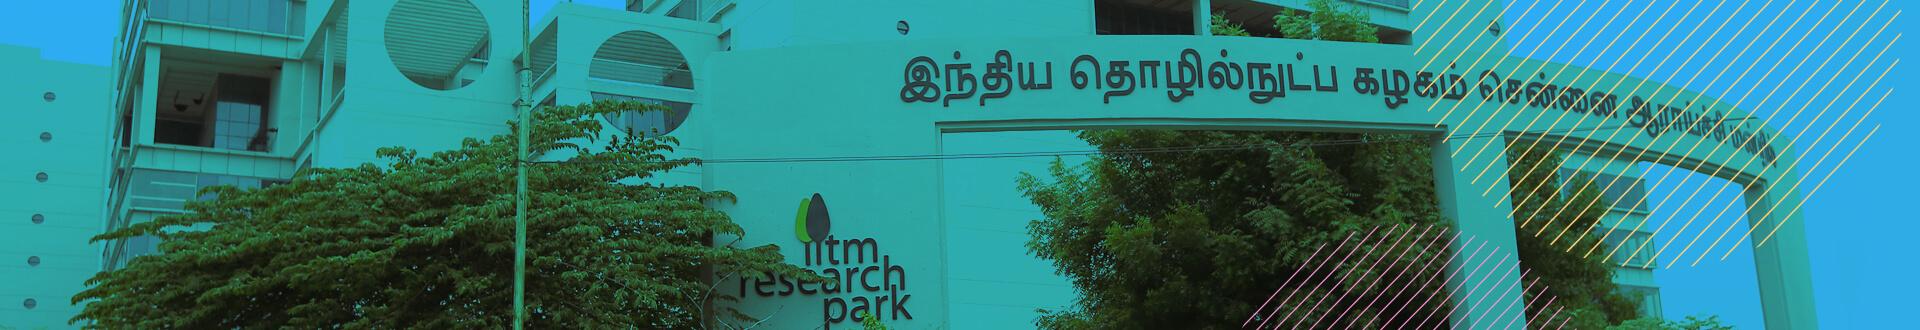 iitm-innovation-ecosystem-banner-desktop